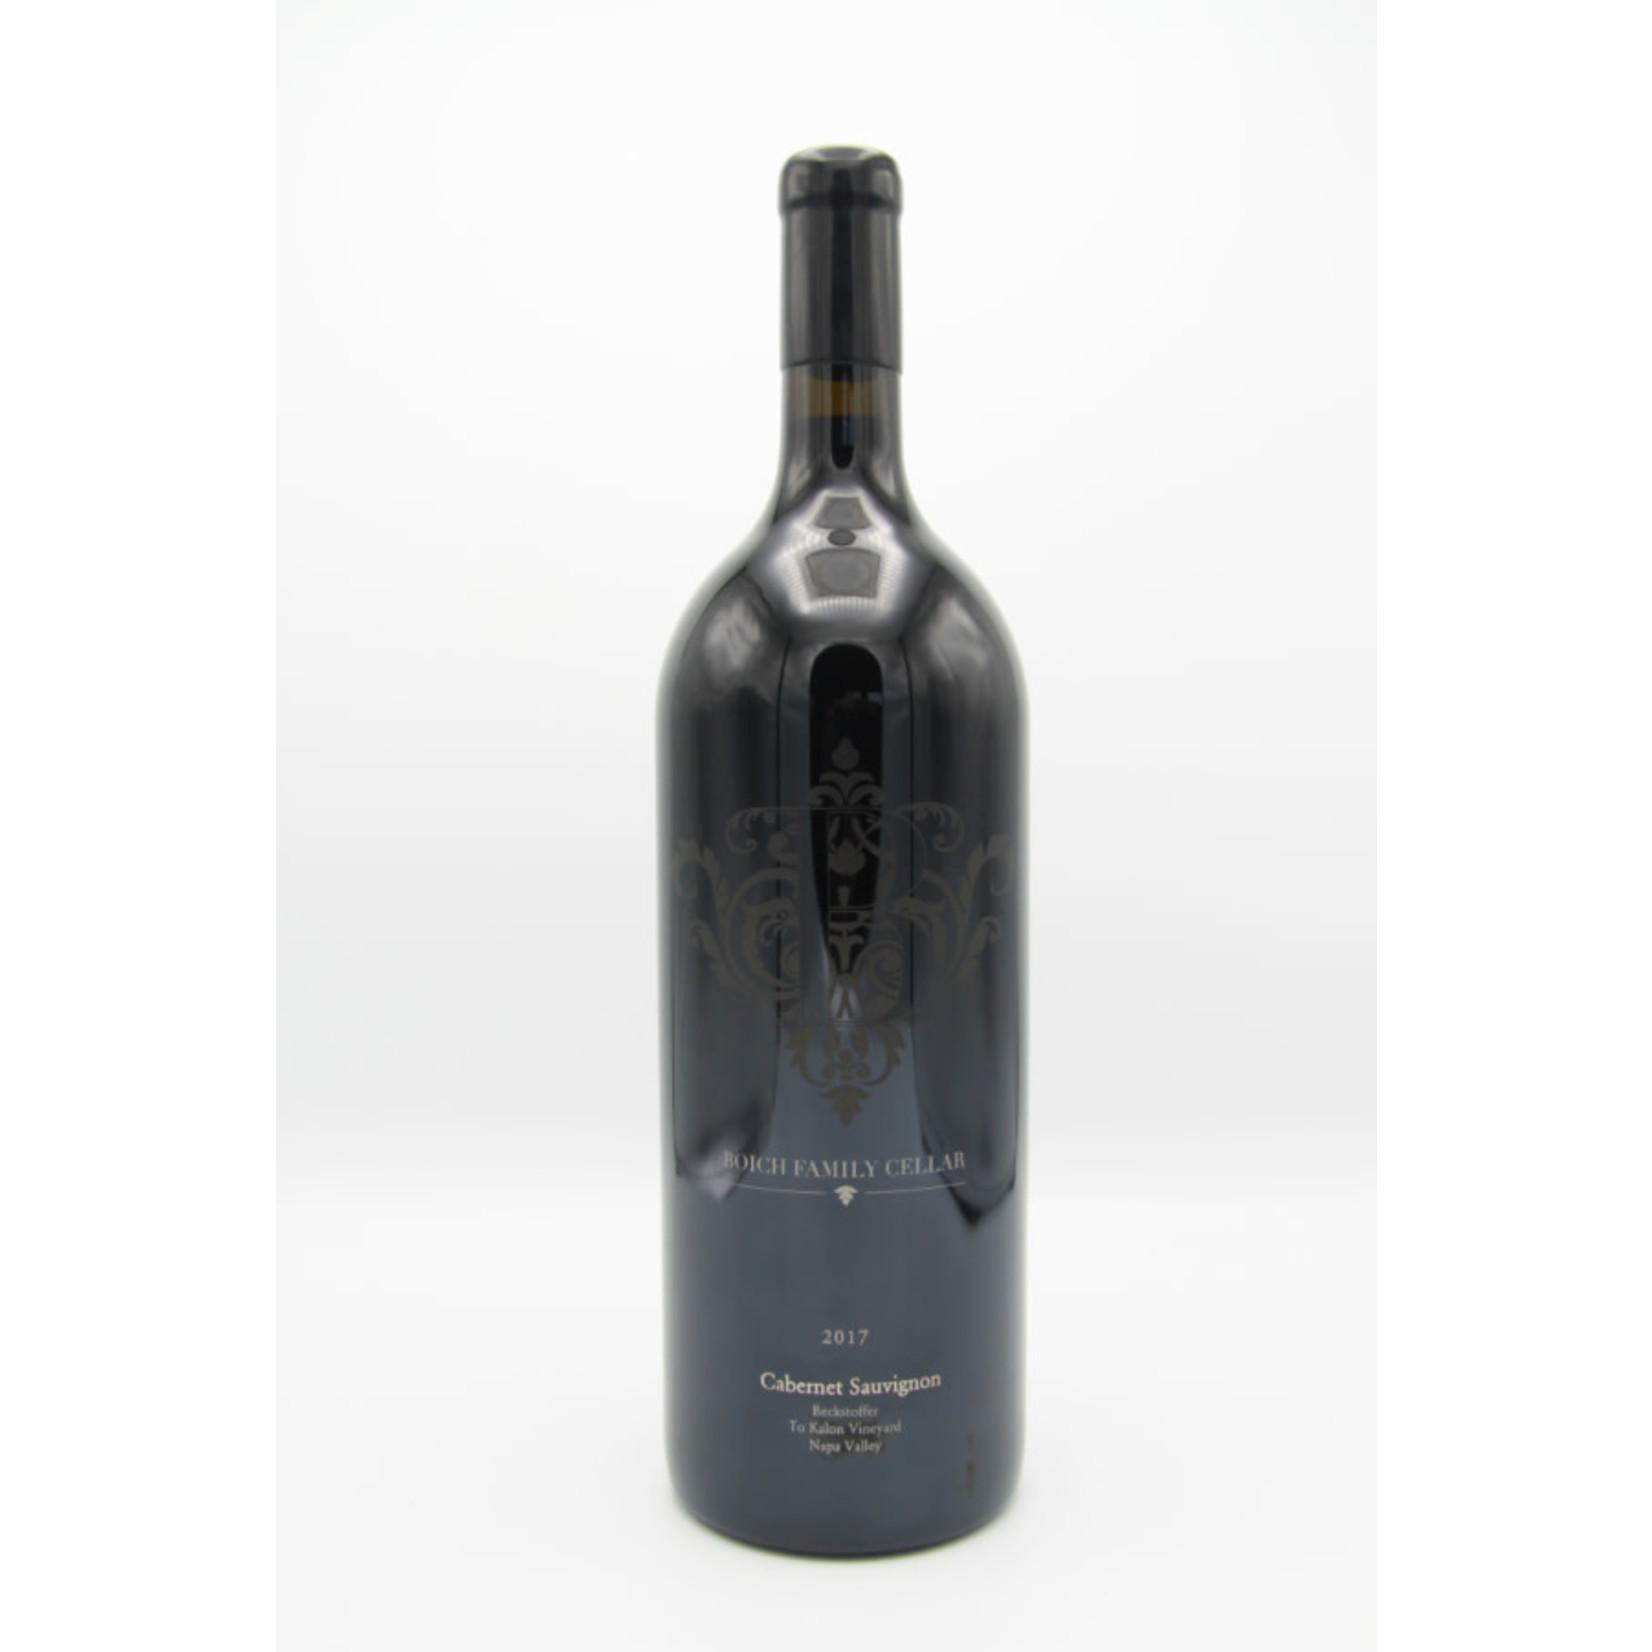 2017 Boich Family Cellar 'Beckstoffer To Kalon Vineyard' Cabernet Sauvignon (1.5L Magnum)